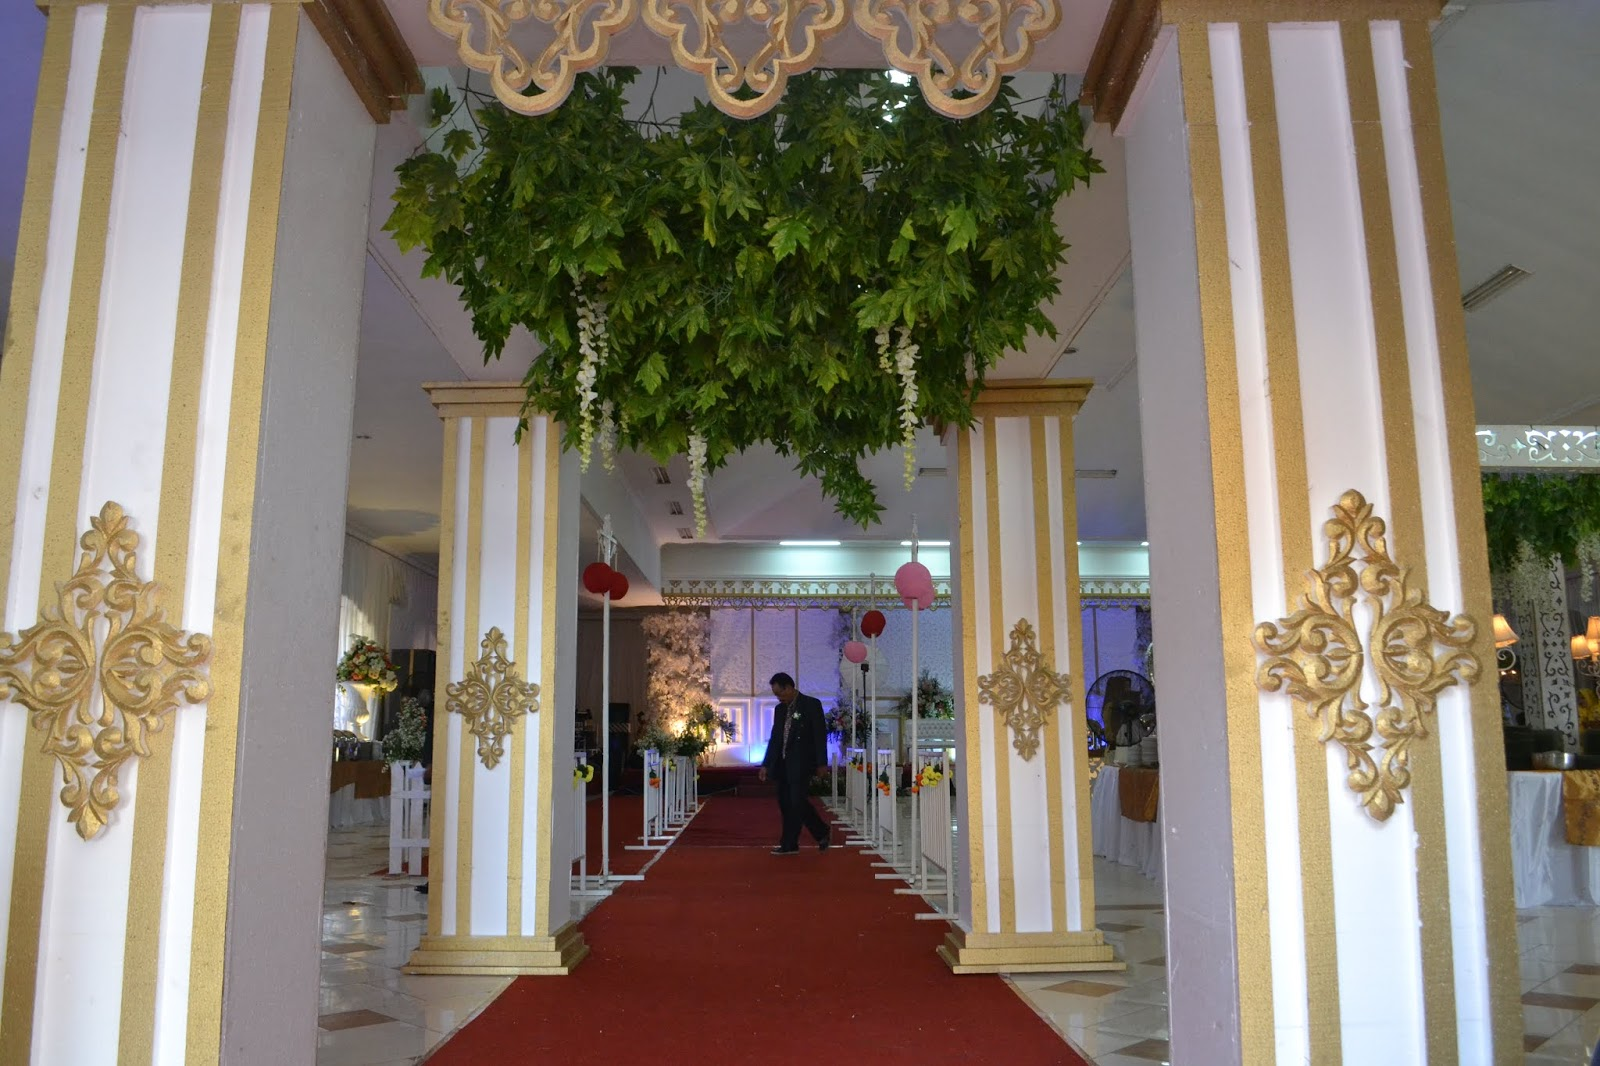 Daftar Harga Paket Pernikahan Daniico Wedding Planner ...